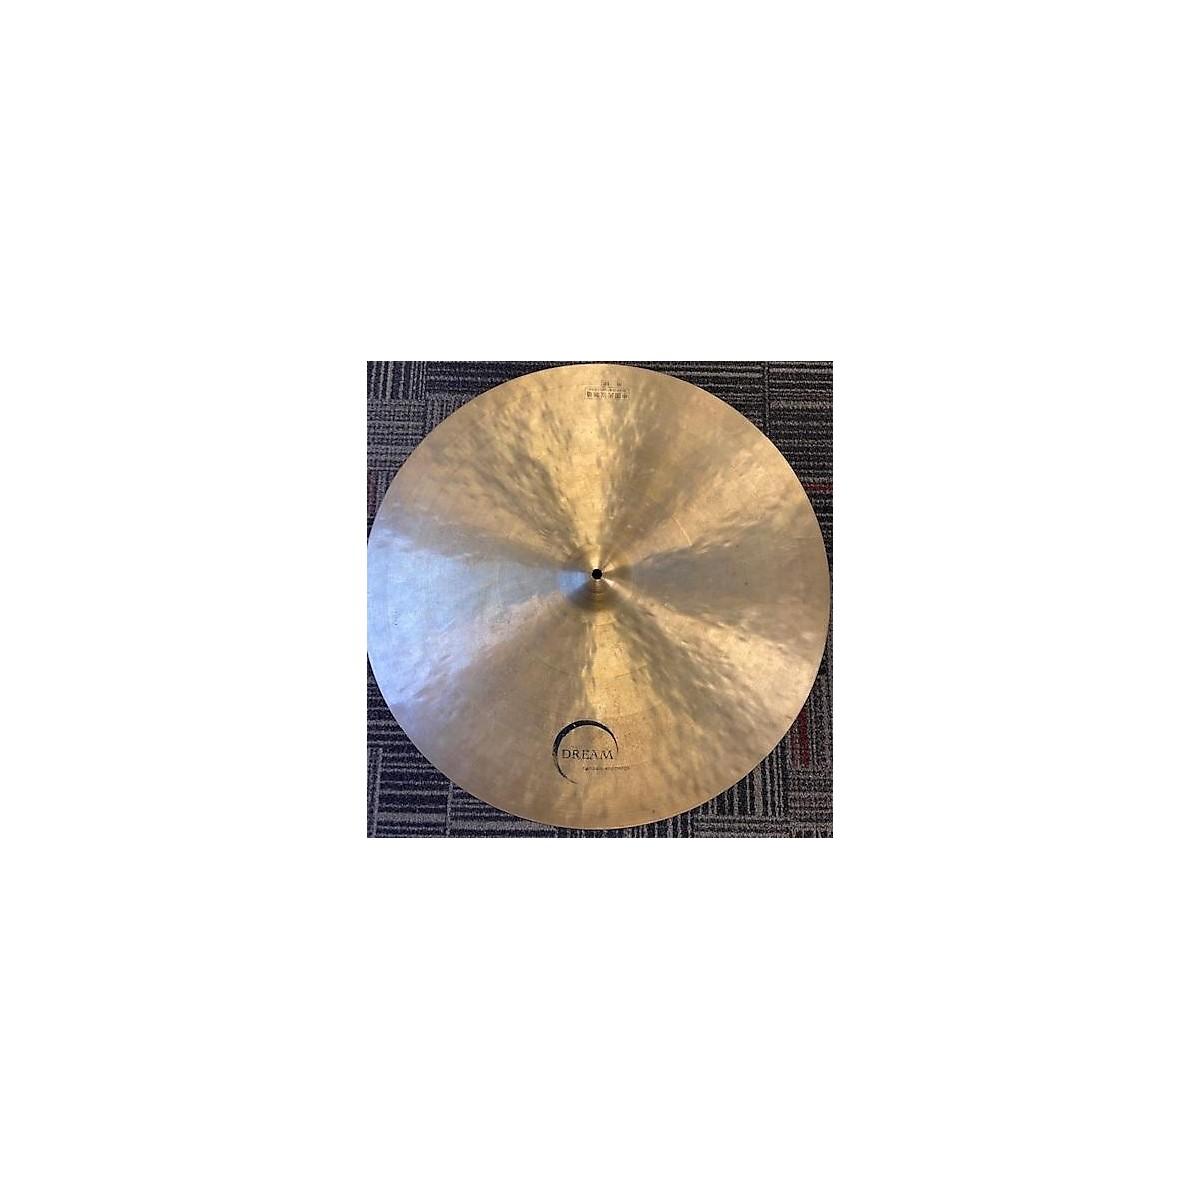 Dream 24in BLISS RIDE Cymbal